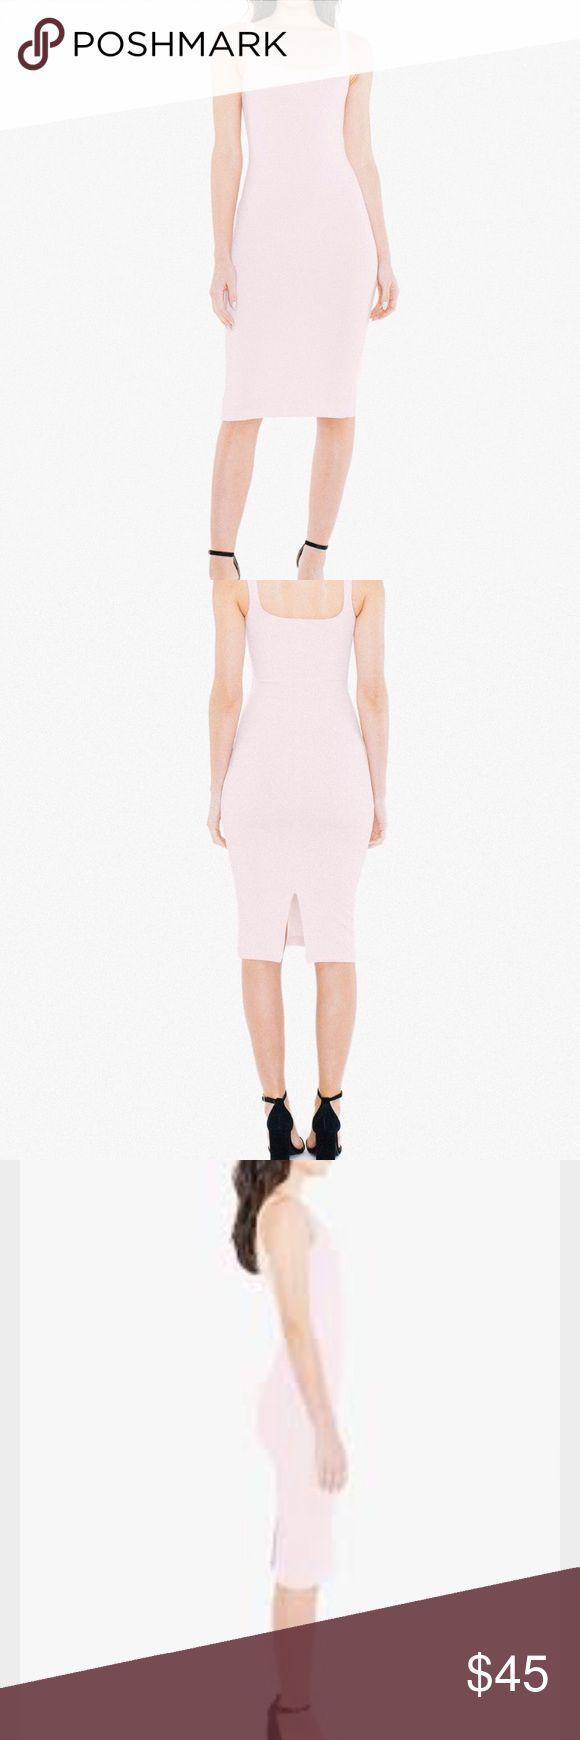 AMERICAN APPAREL PINK PONTE DRESS Pink bodycon dress brand new, never worn. American Apparel Dresses Midi